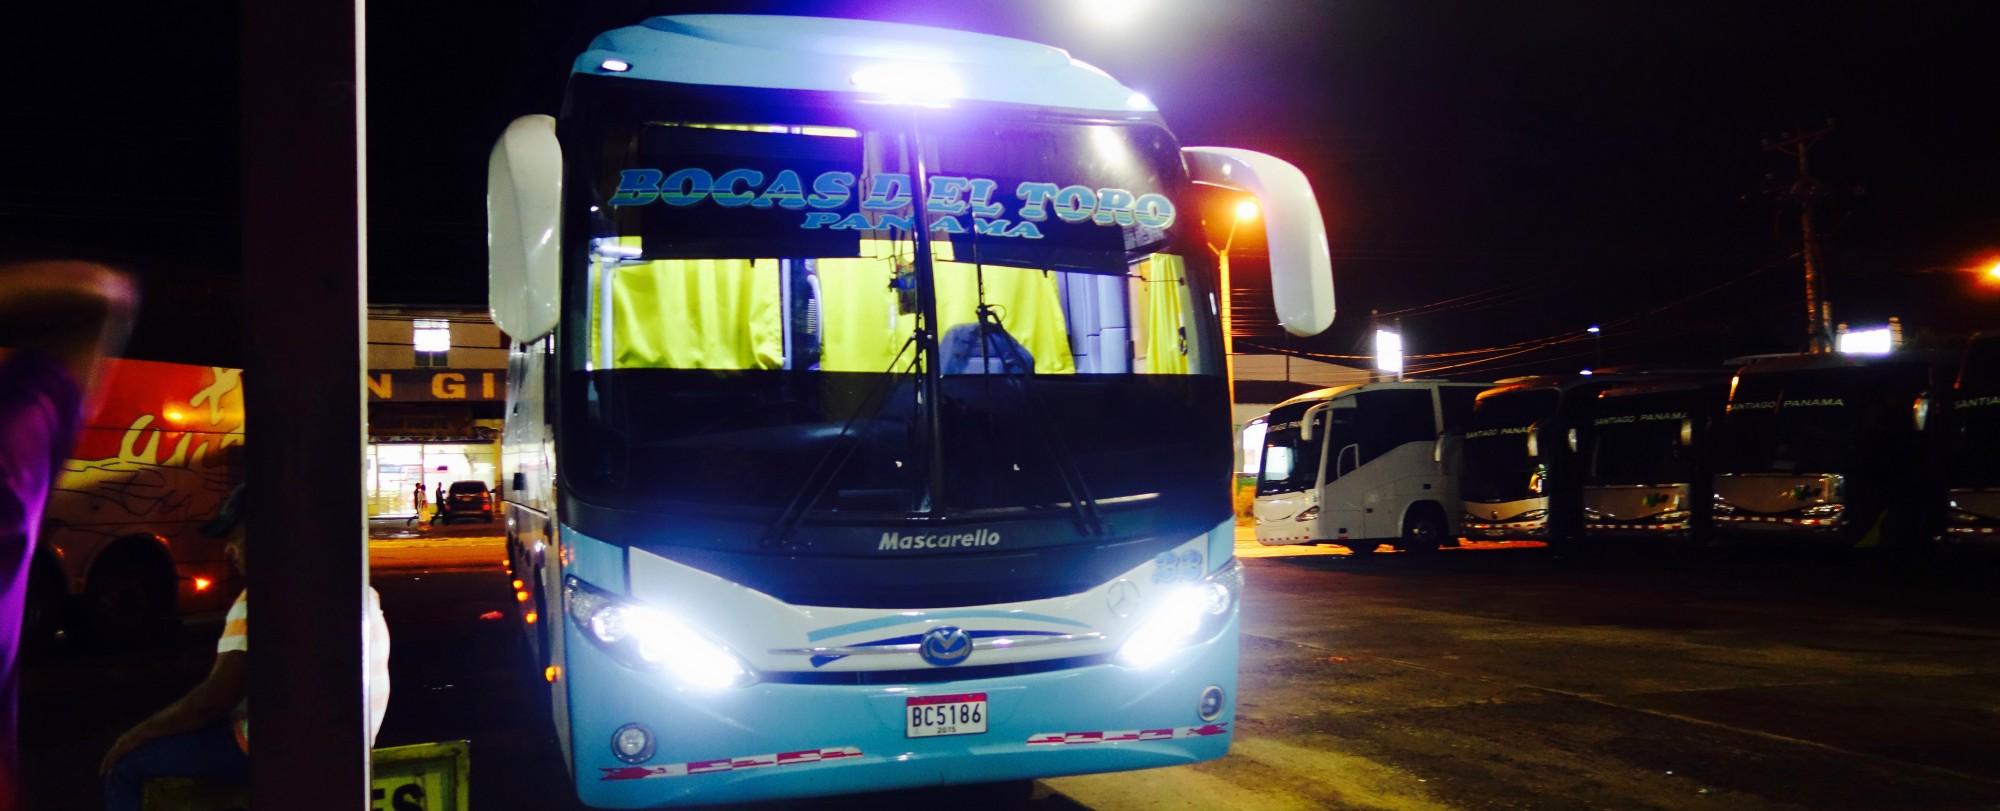 Bus Panama City to Bocas Del Toro, How To Get From Panama City Airport To Bocas Del Toro - All Possible Ways